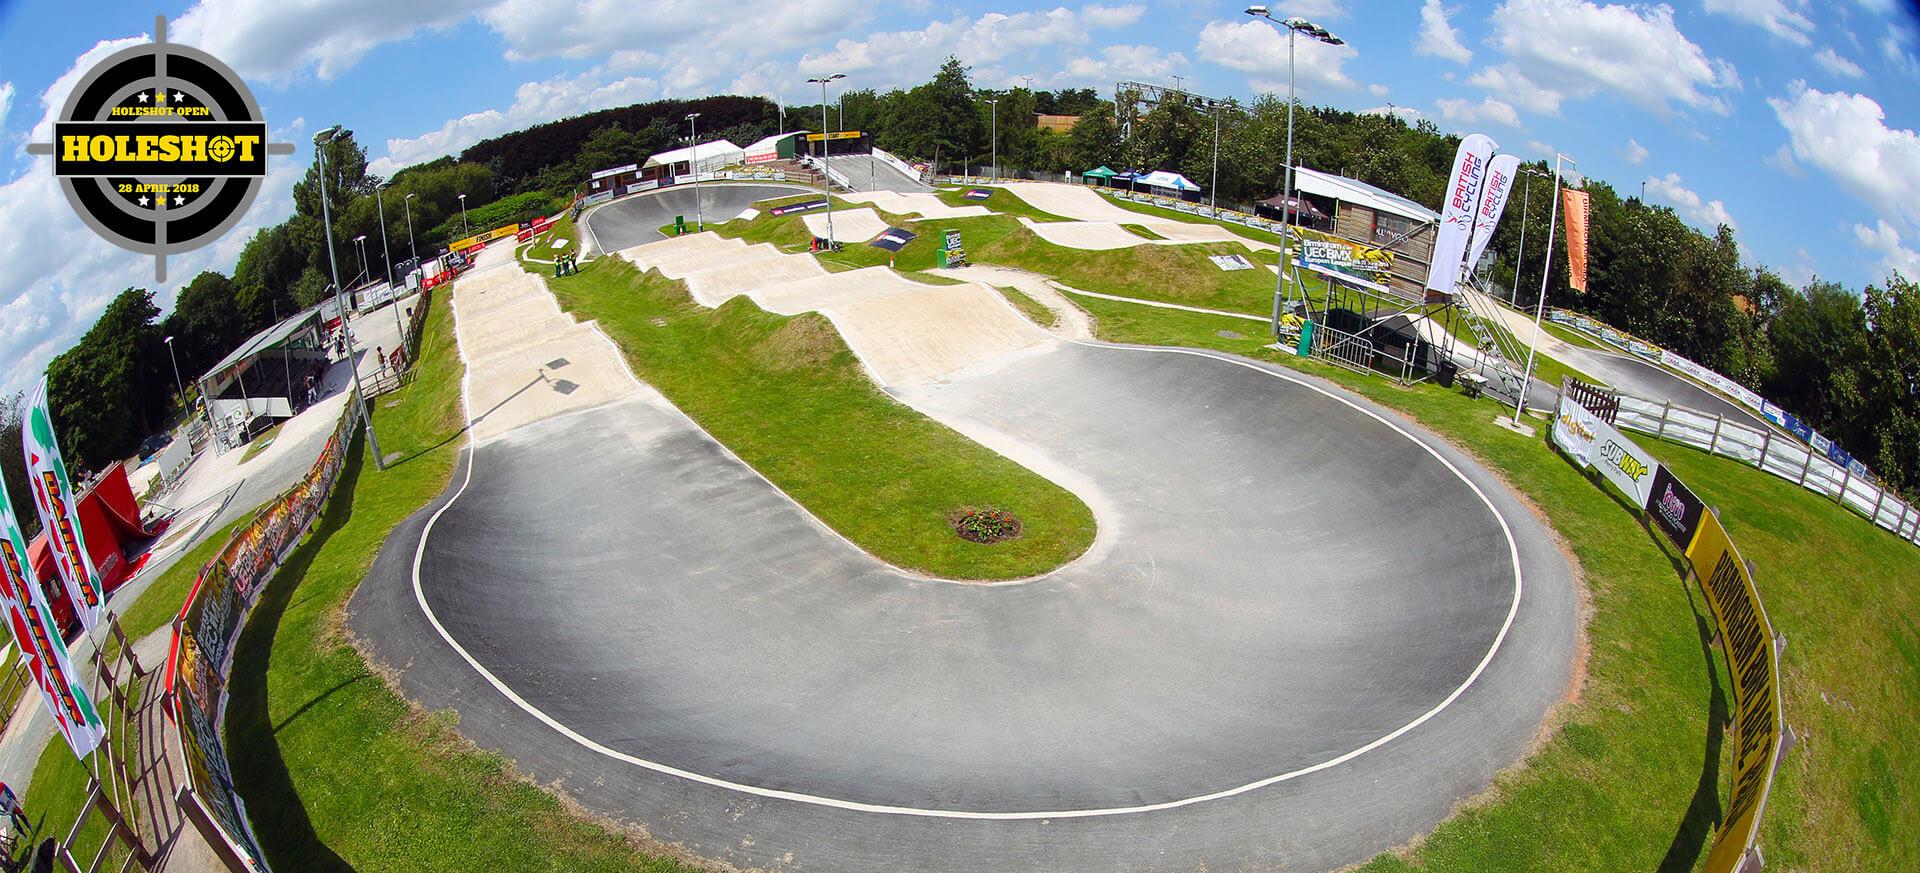 NXT Bike Park Holeshot Open